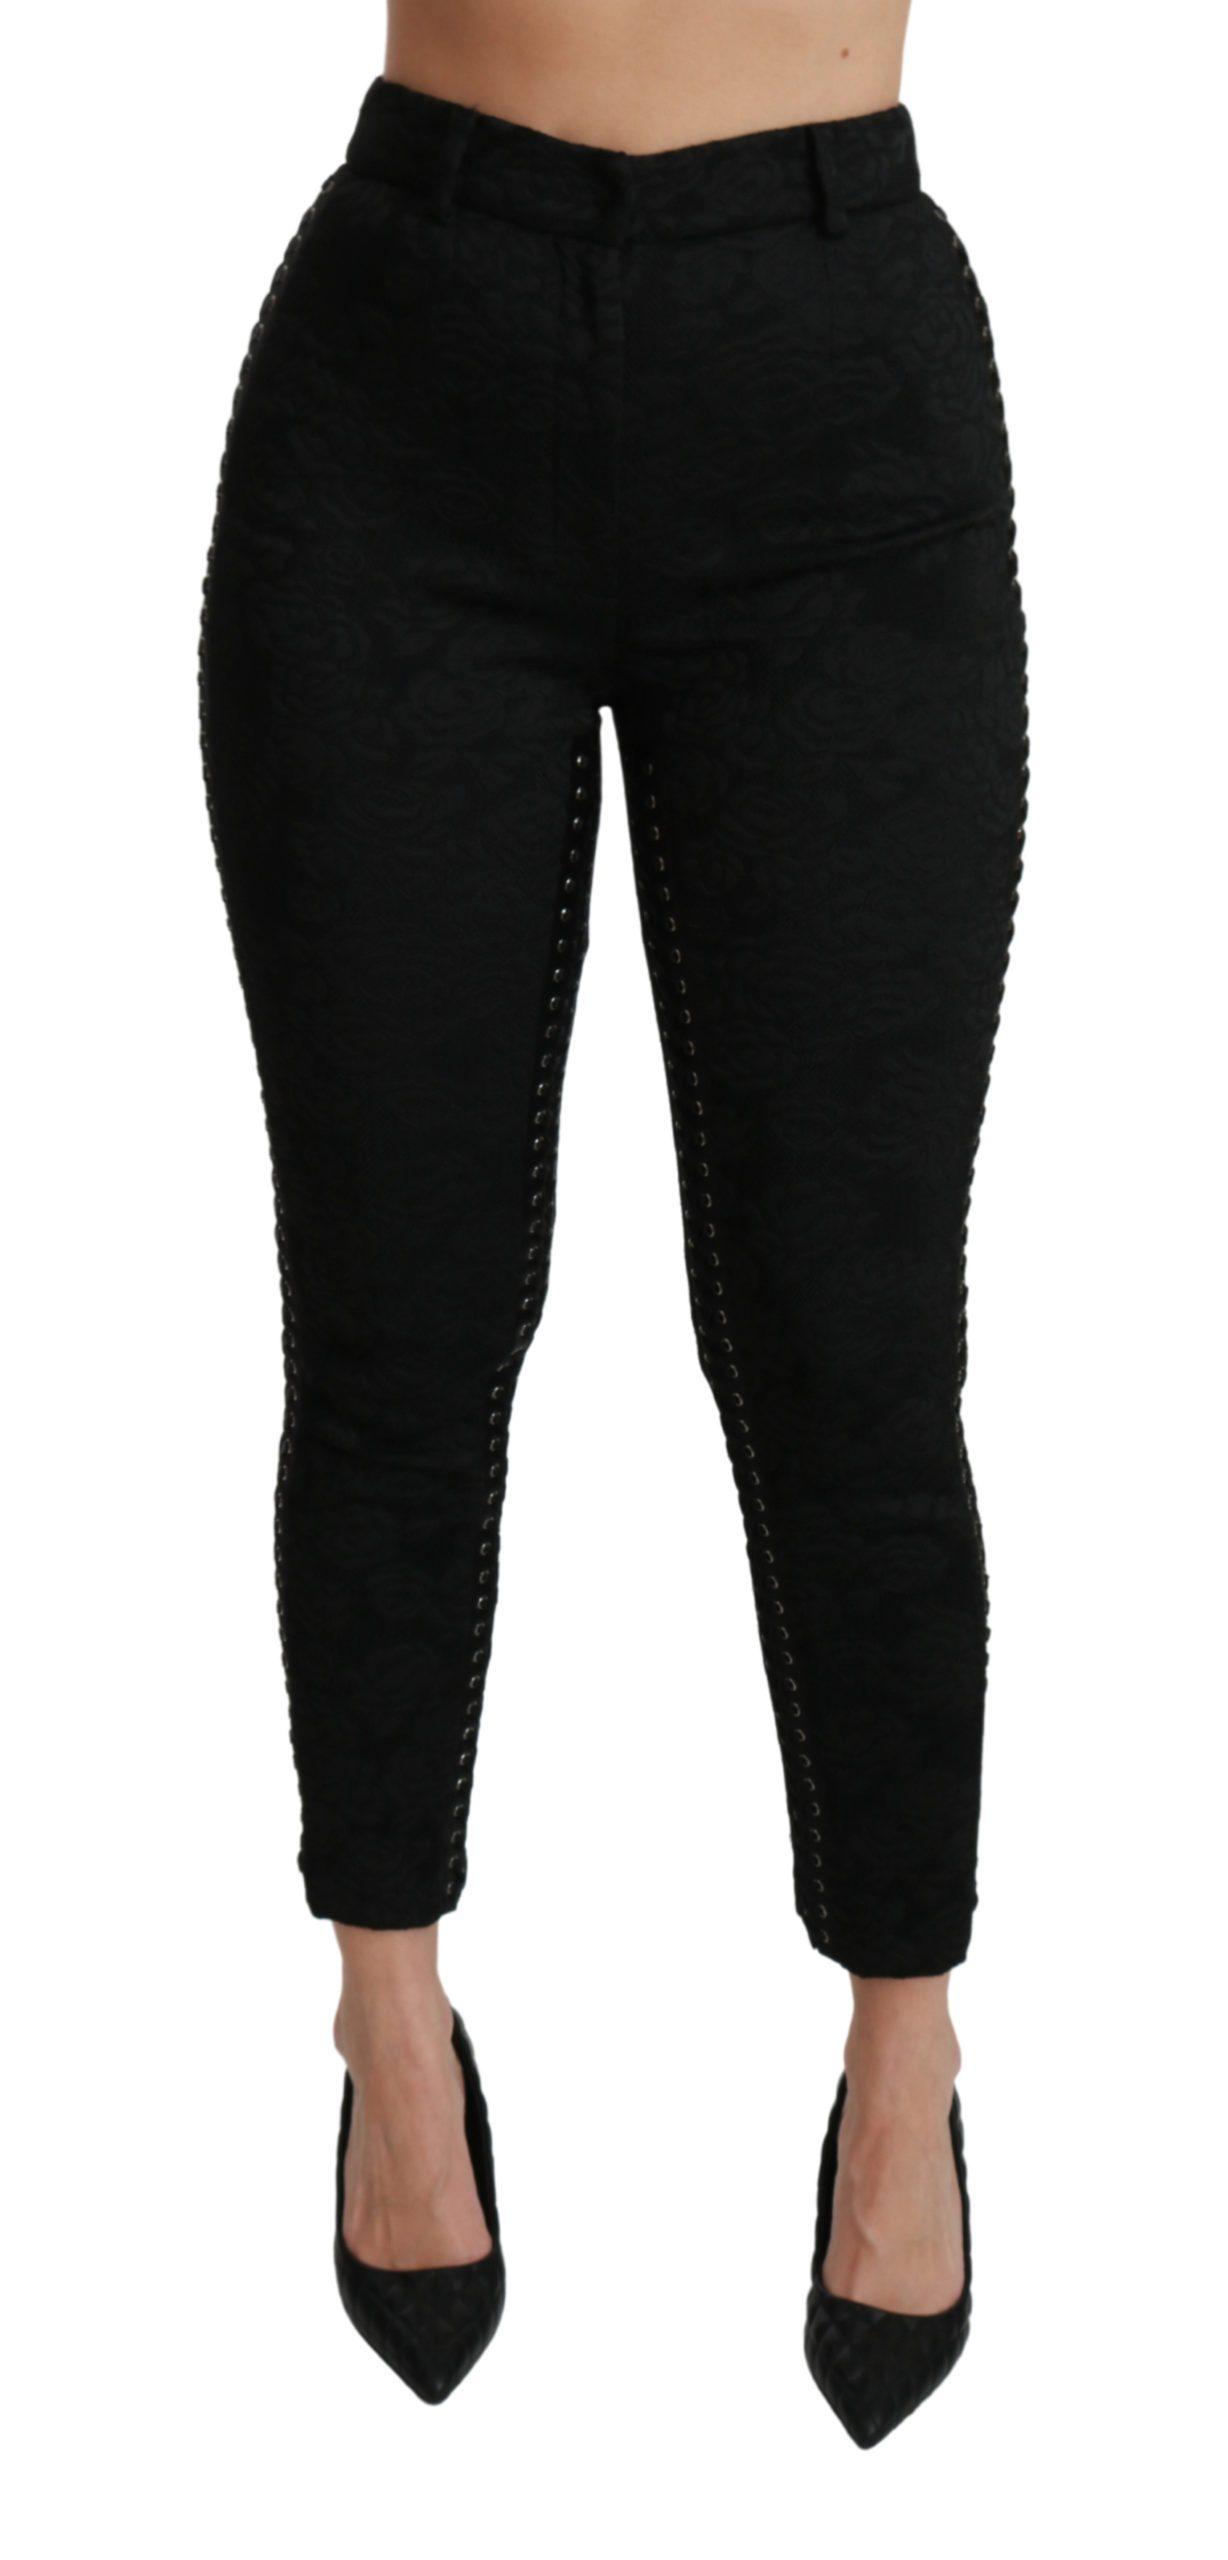 Dolce & Gabbana Women's Brocade Skinny High Waist Trouser Black PAN70942 - IT40 S